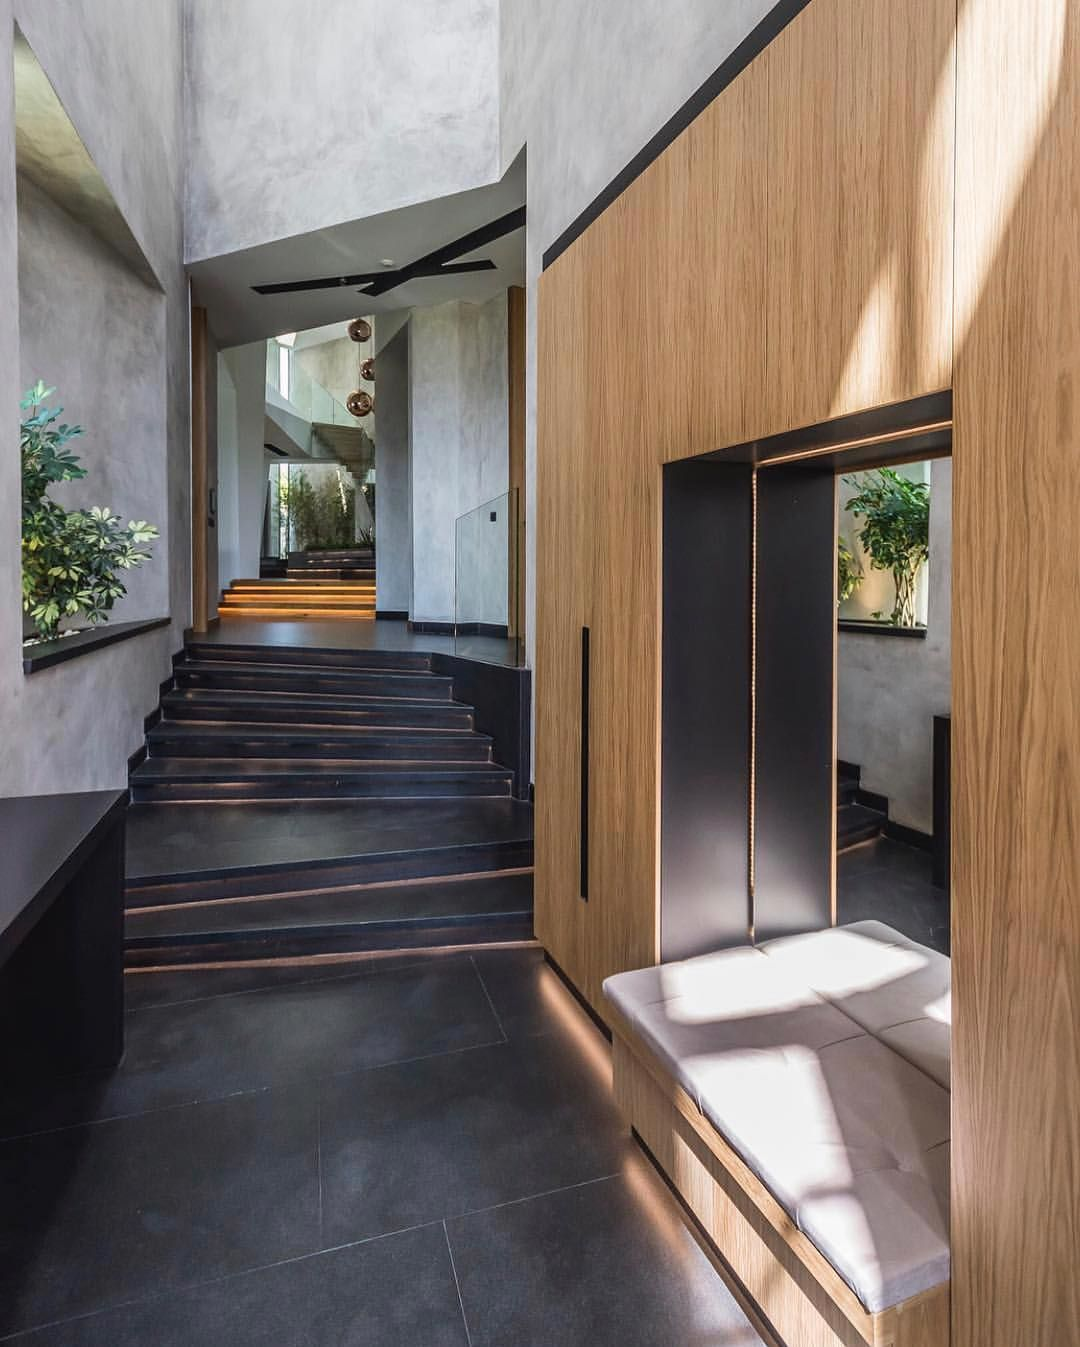 Top Home Decor 2019 In 2020 Interior Design Colleges Home Decor